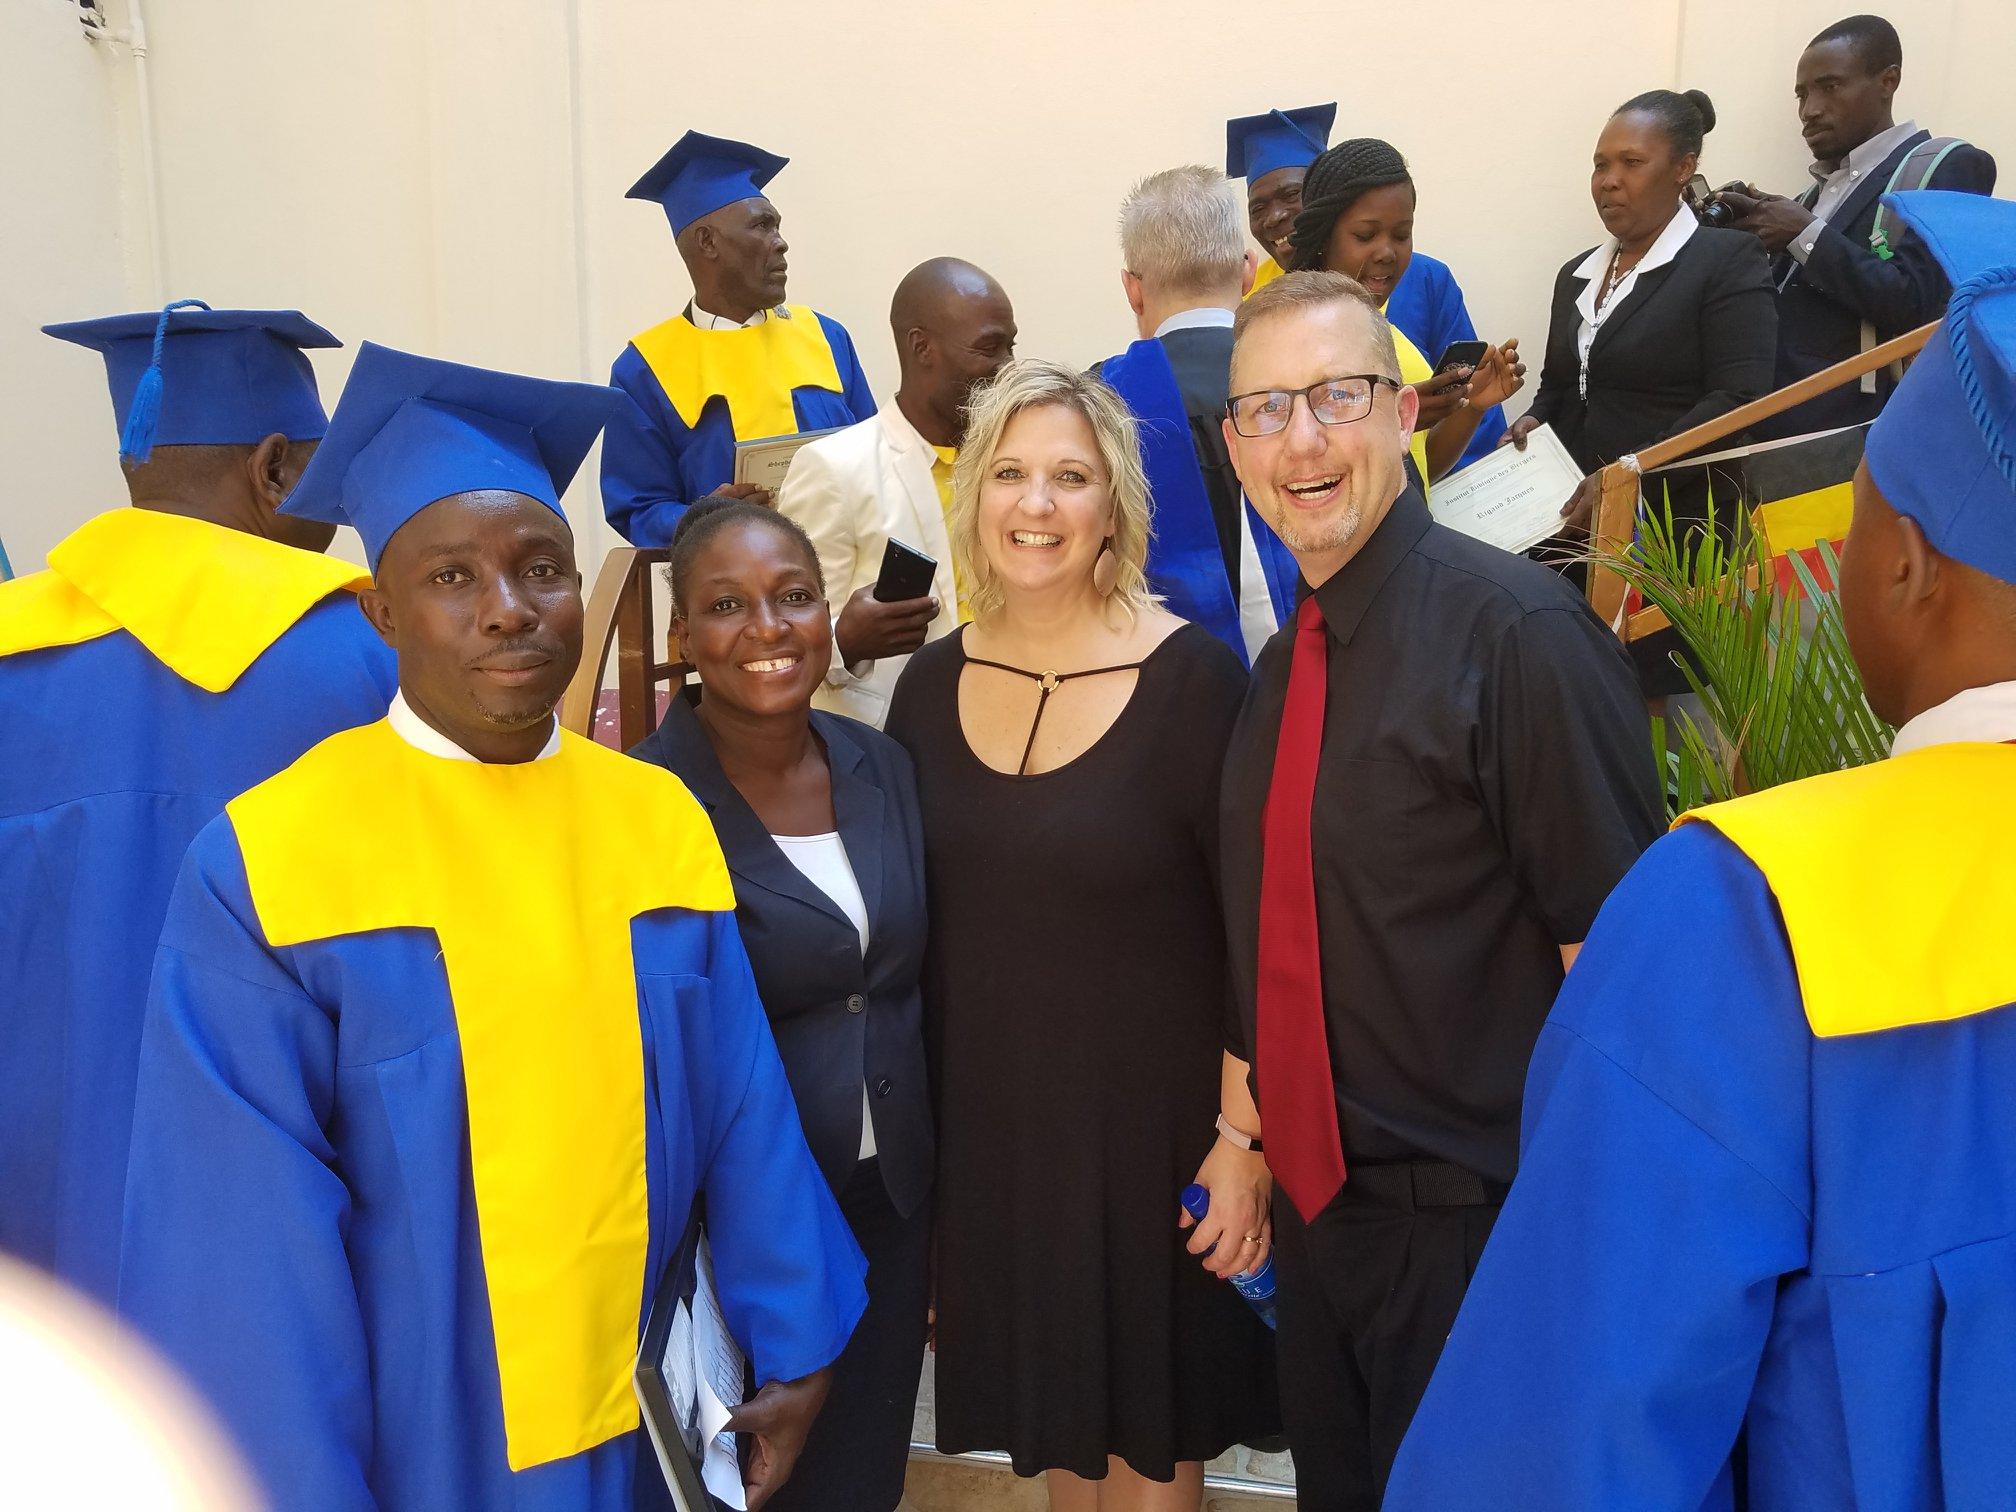 Haiti Pastor Training Graduation 3 - Mark and Becky Sterken.jpg